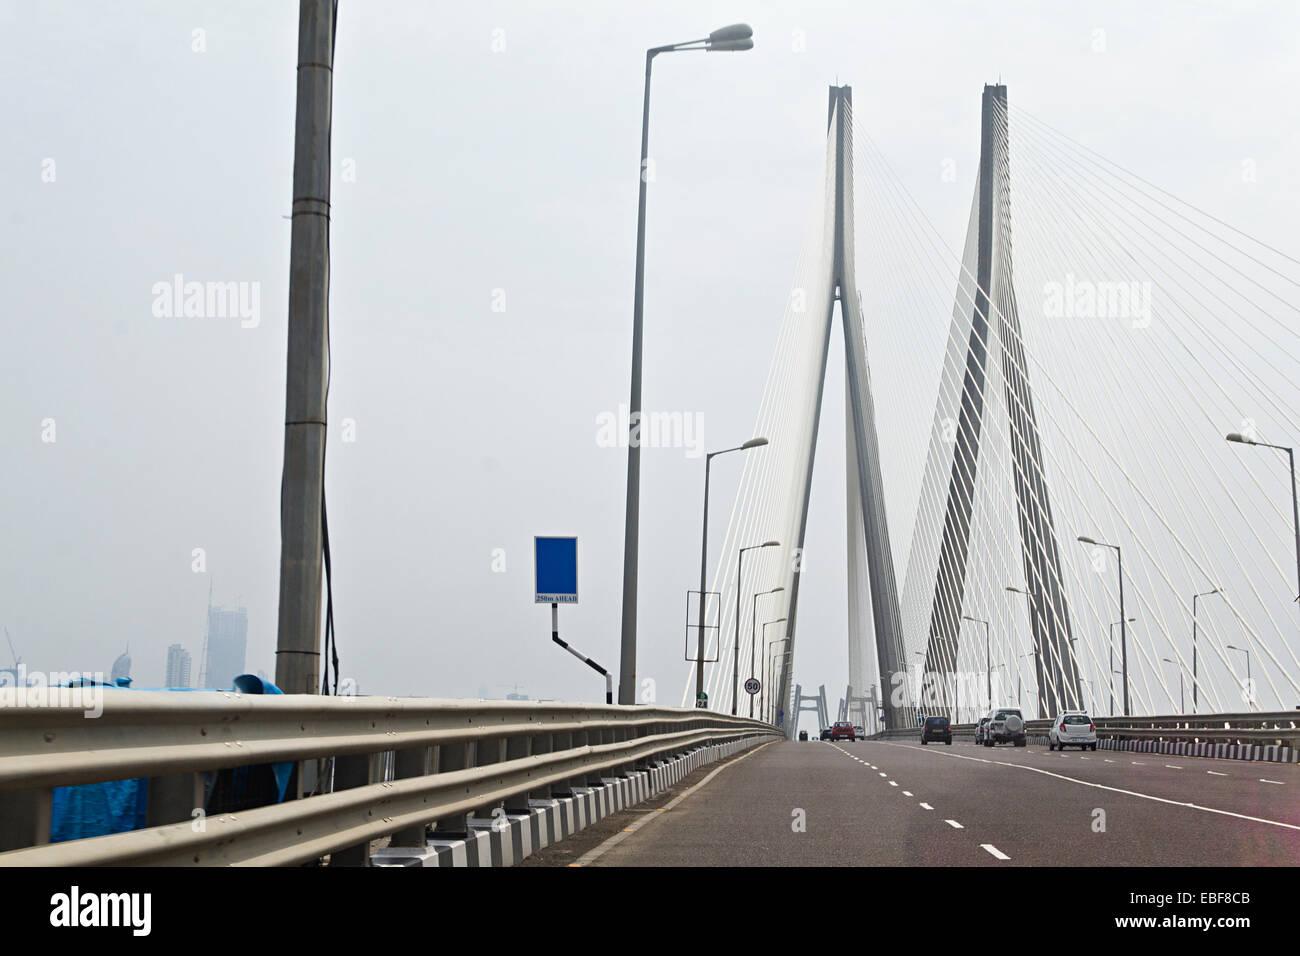 Inde Mumbai Bridge Flyover Banque D'Images